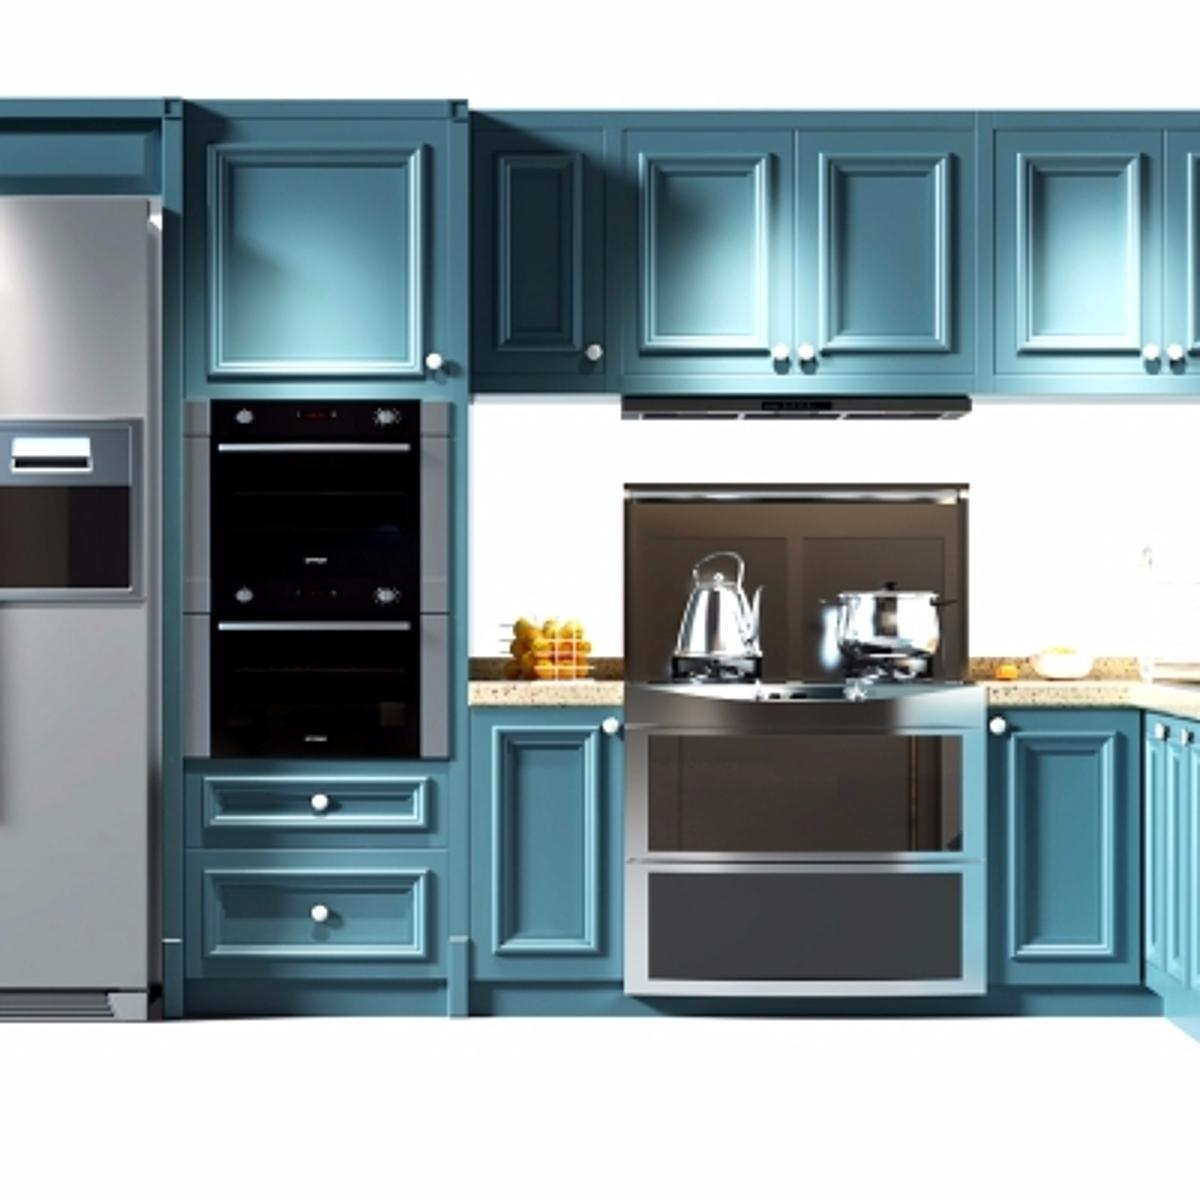 cg241现代实木橱柜冰箱组合模型